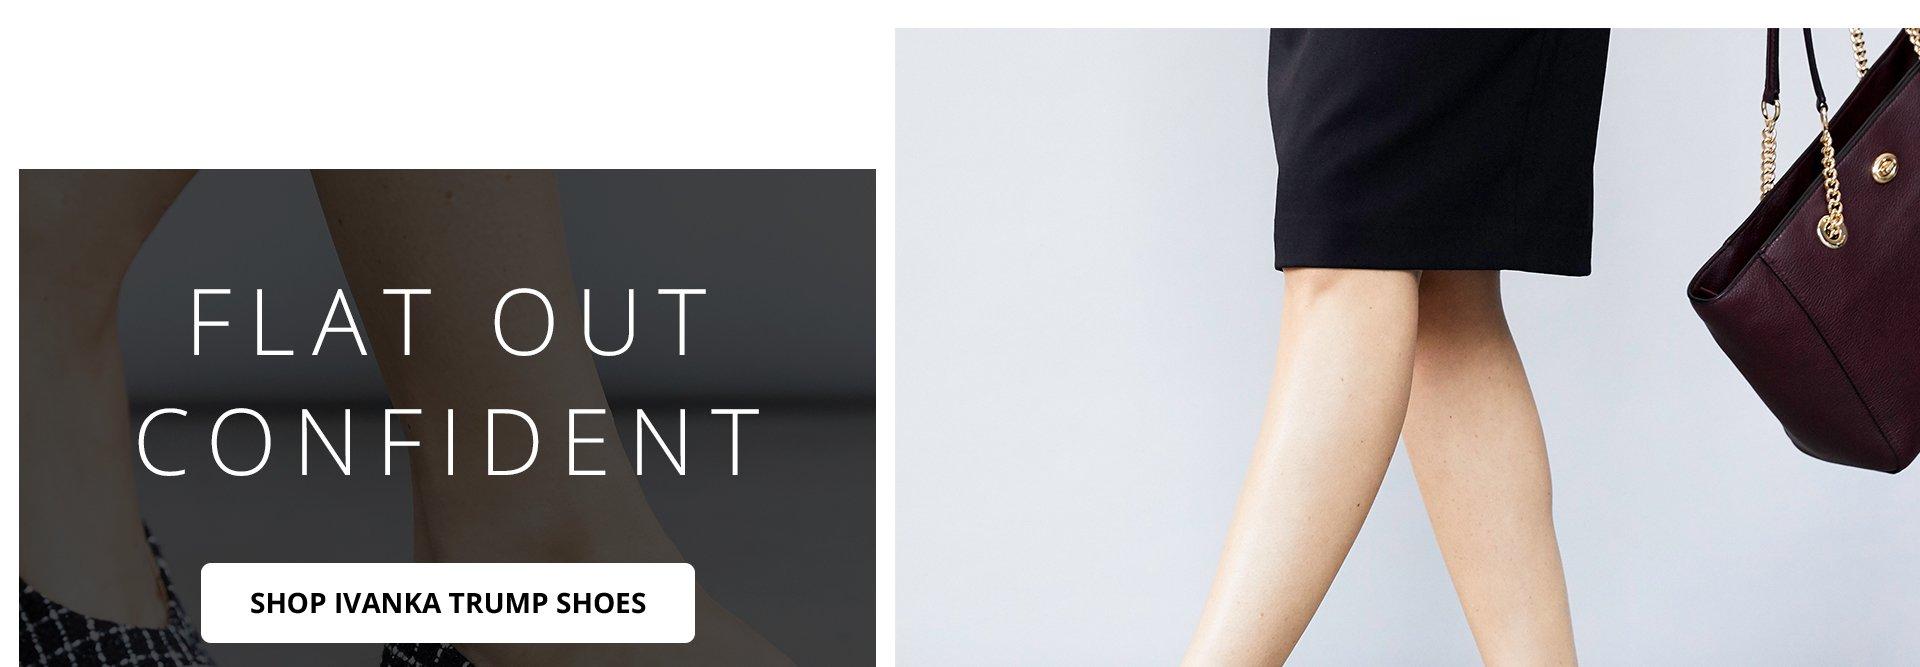 Flat out confident. Shop Ivanka Trump Shoes.